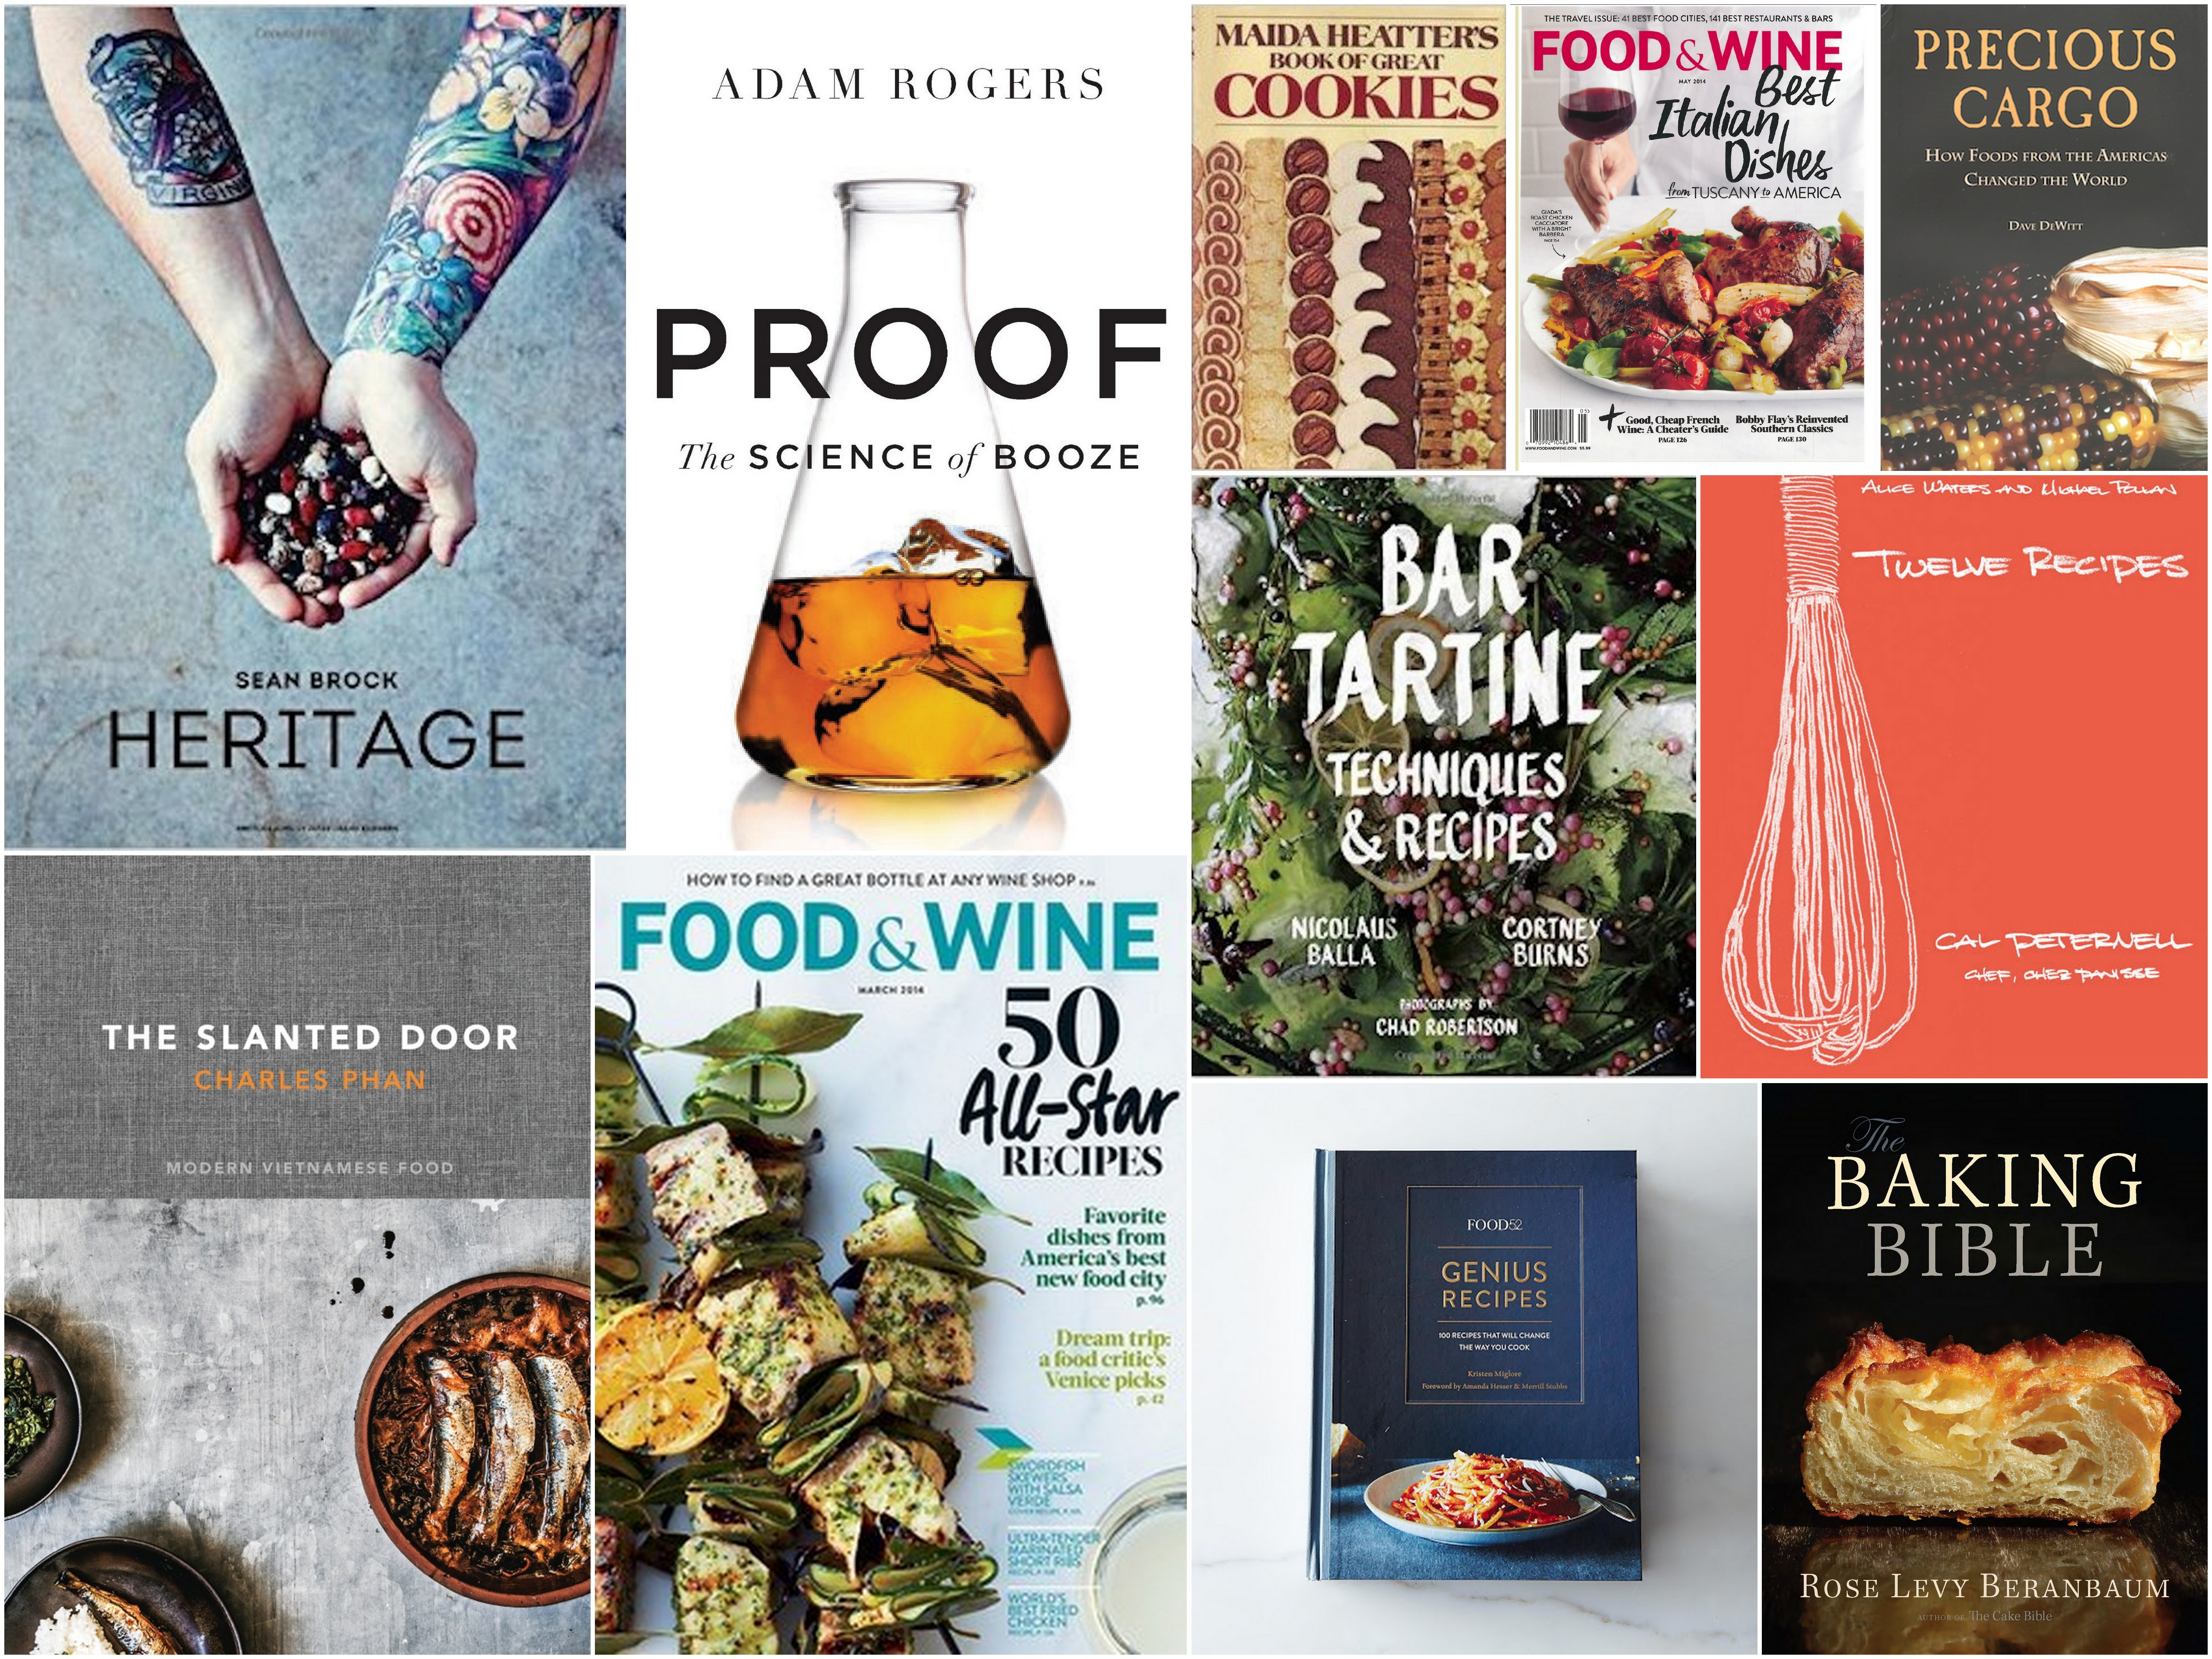 IACP Announces 2015 Food Writing Award Winners